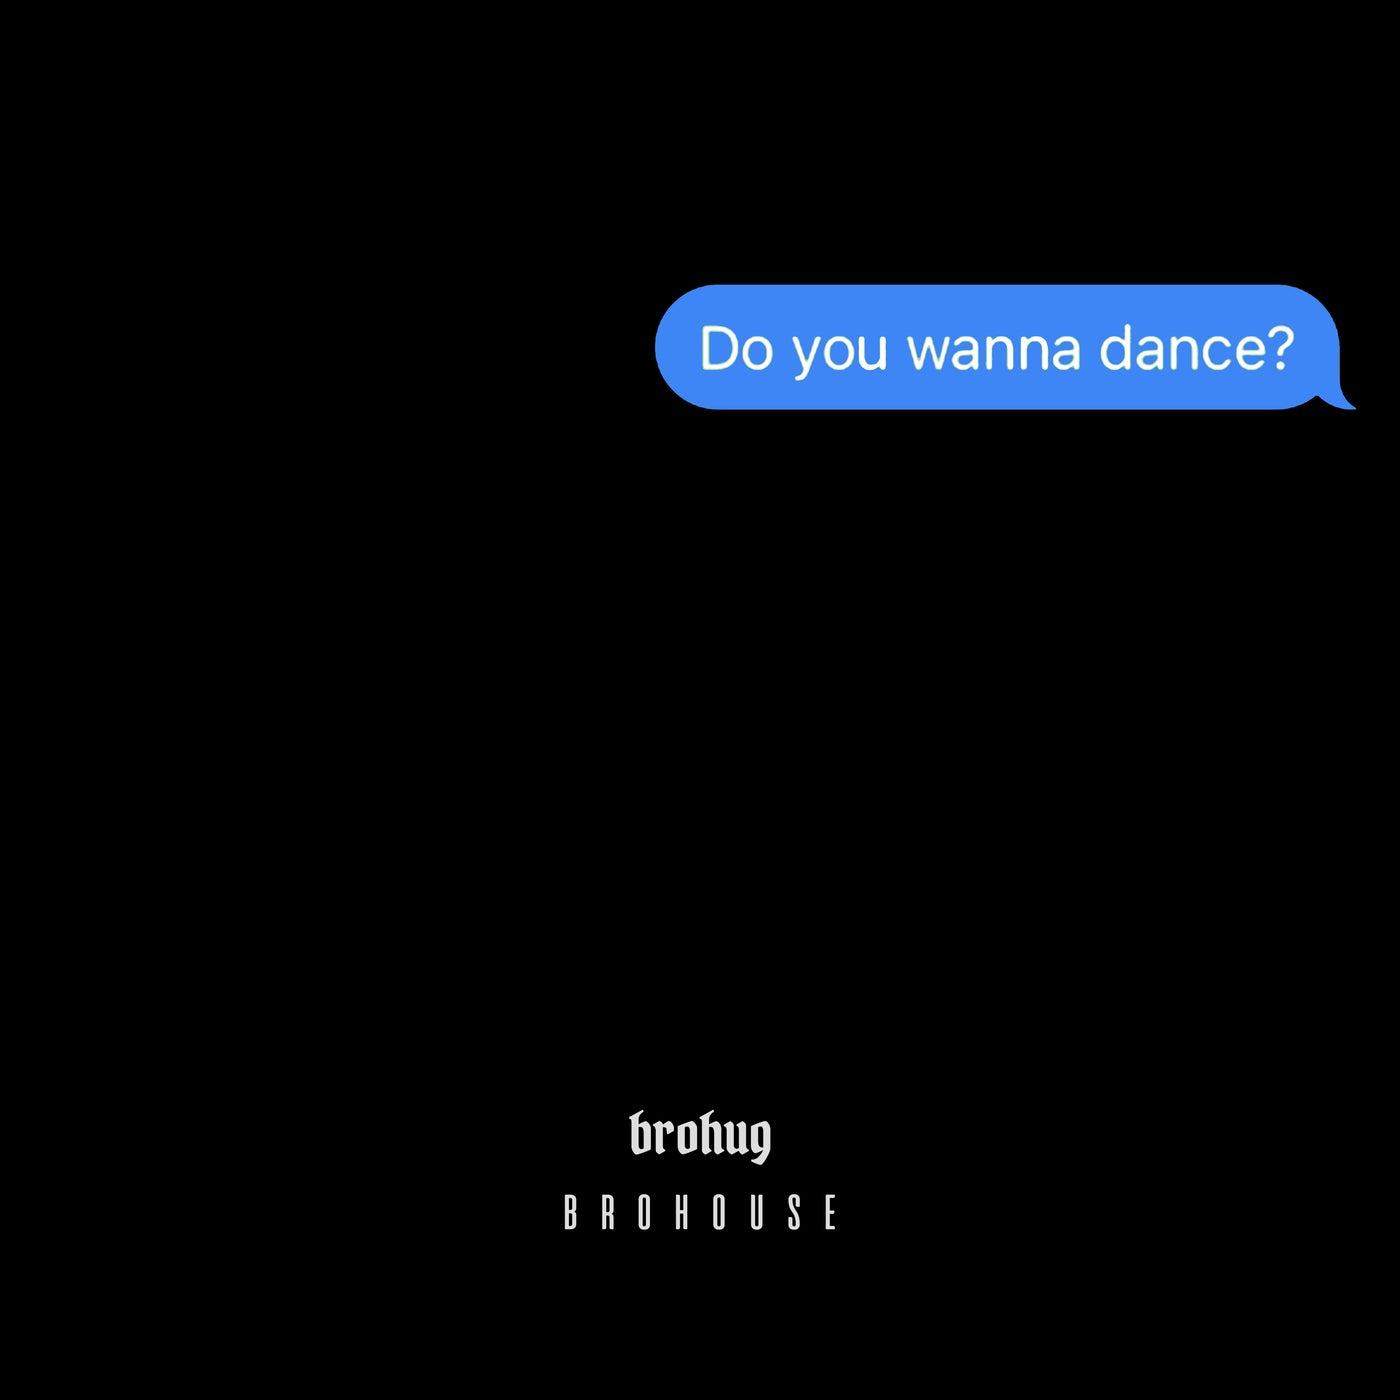 Do You Wanna Dance? (Original Mix)